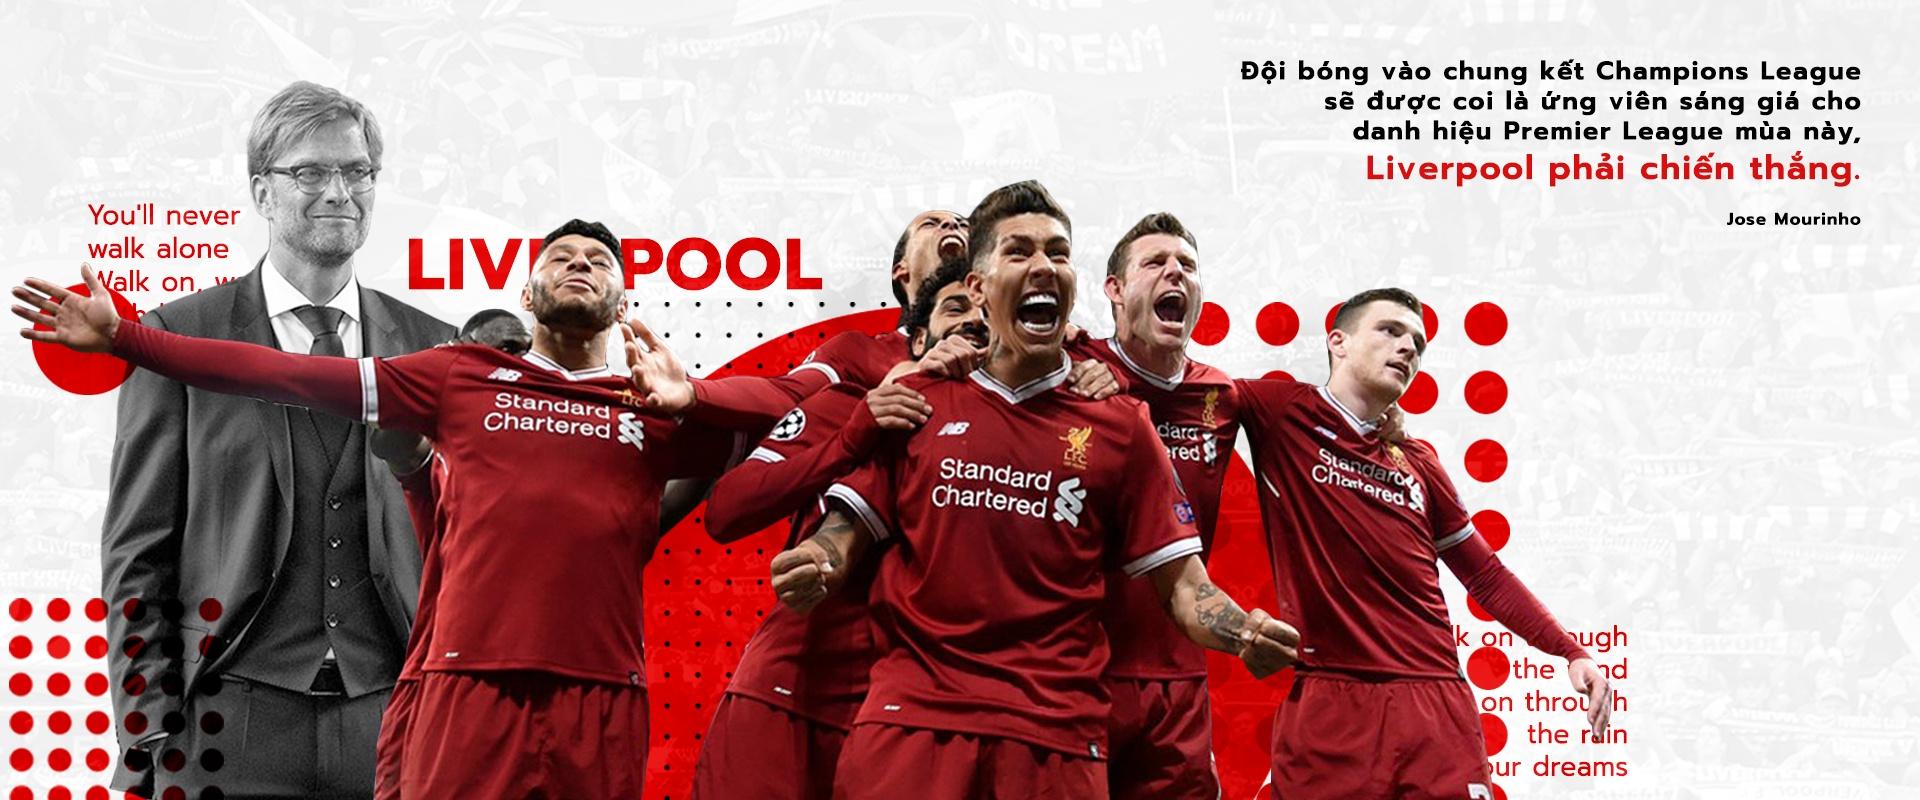 Liverpool: Noi nhuc, hy vong va giac mong Premier League hinh anh 15